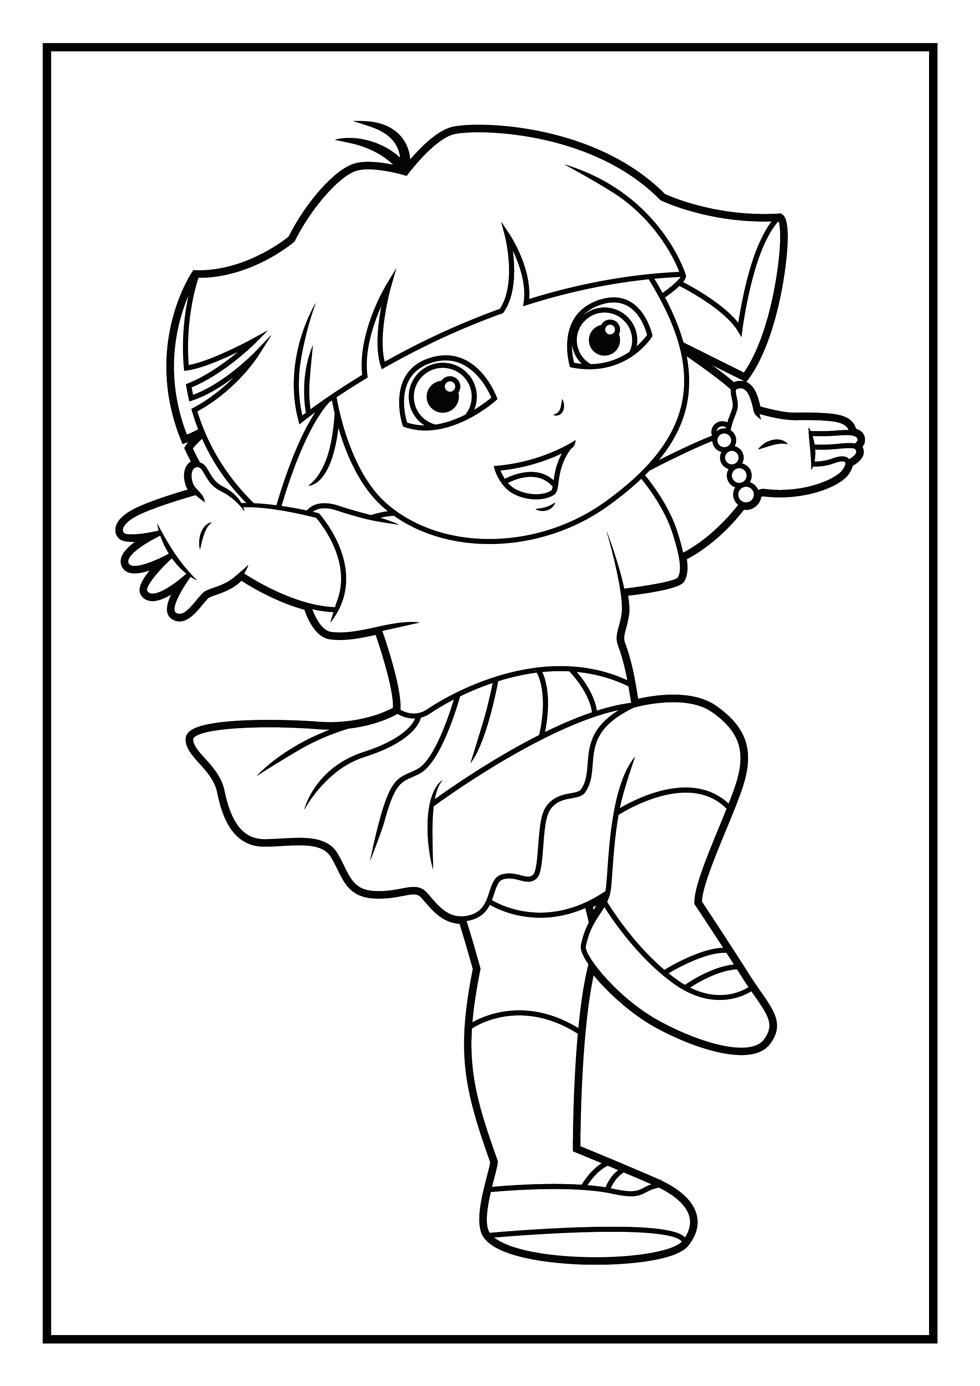 coloring dora dora coloring pages cutecoloringcom dora coloring